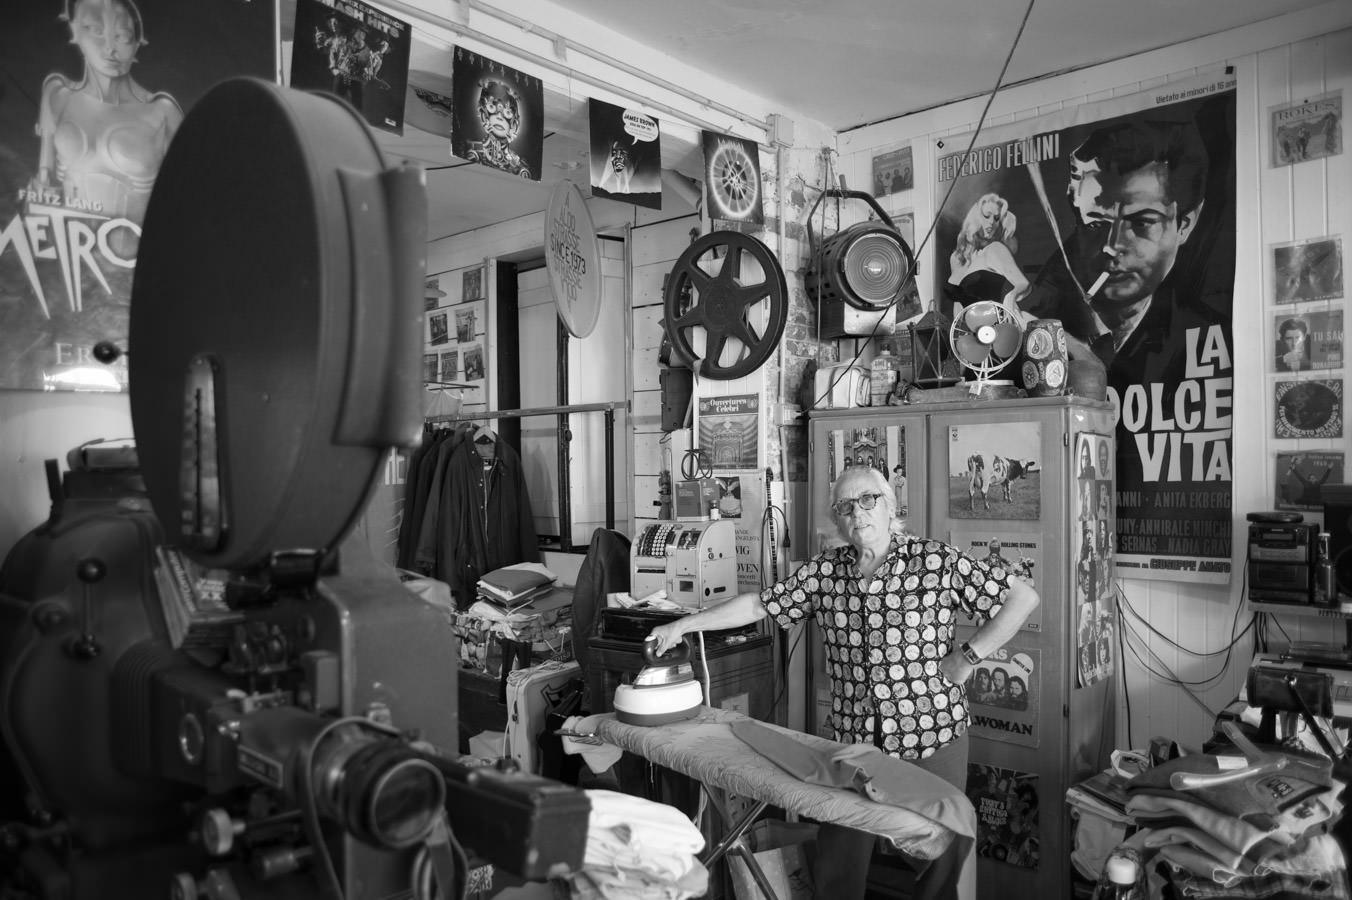 Inside the shop of Aldo Strasse.